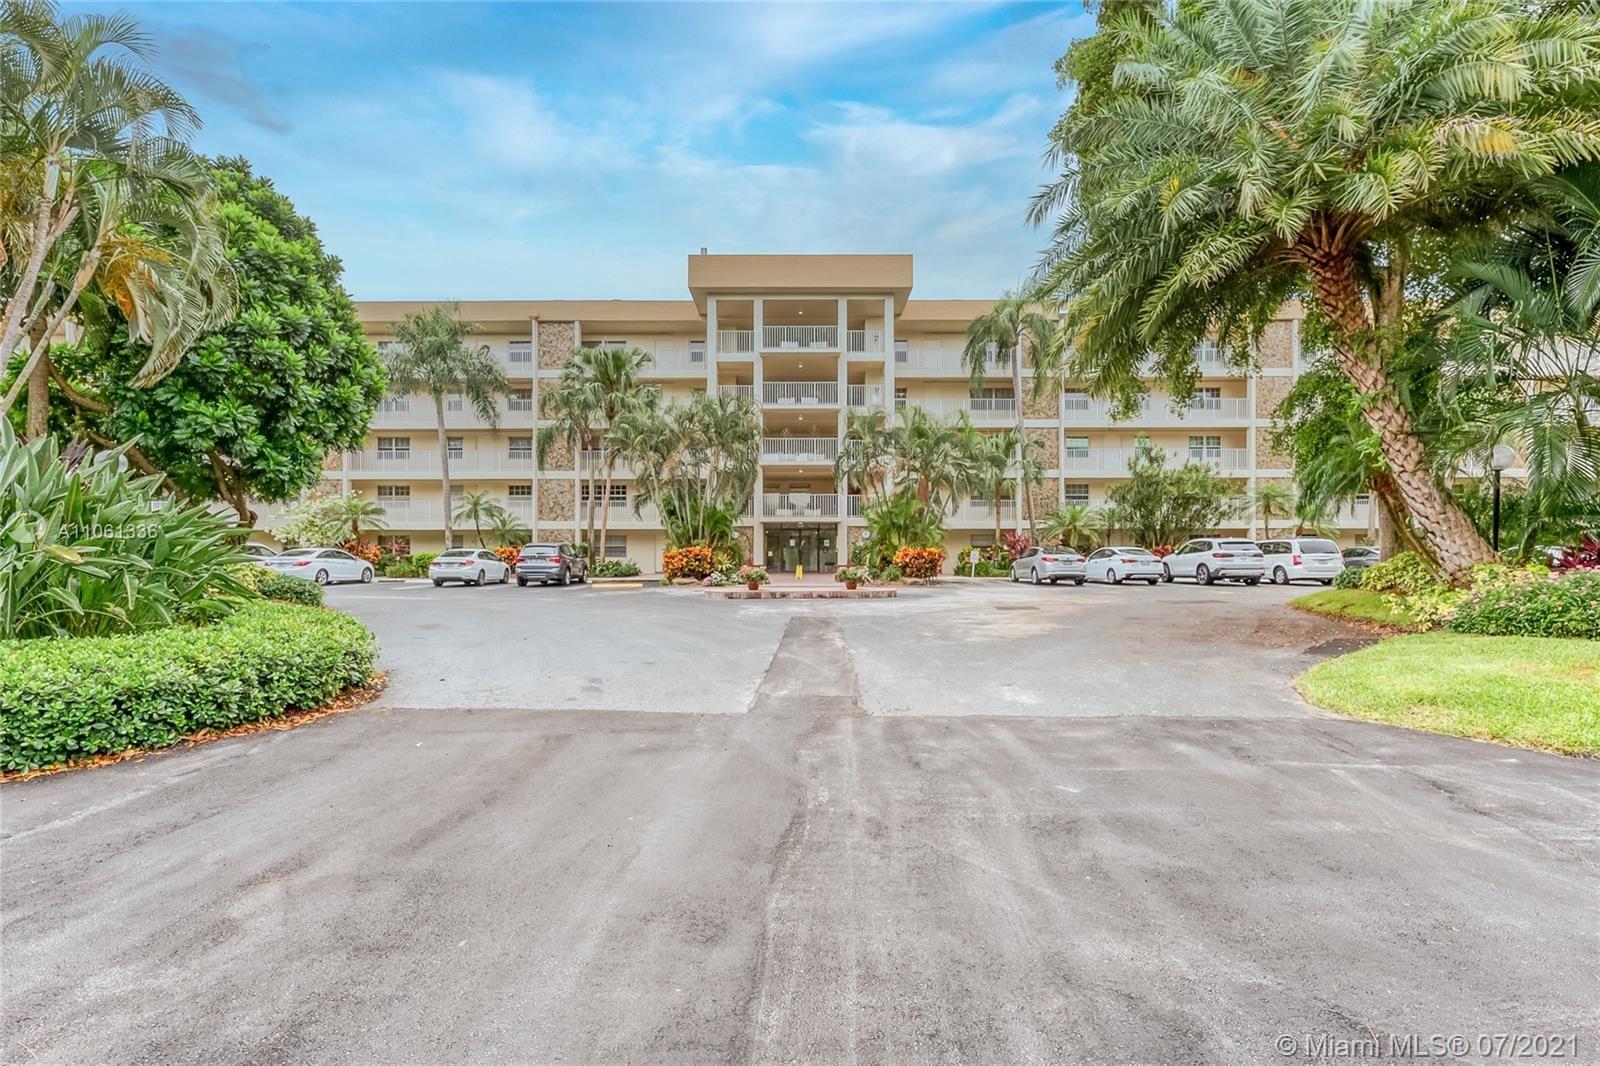 4000 Cypress Grove Way #508, Pompano Beach, FL 33069 - #: A11061336